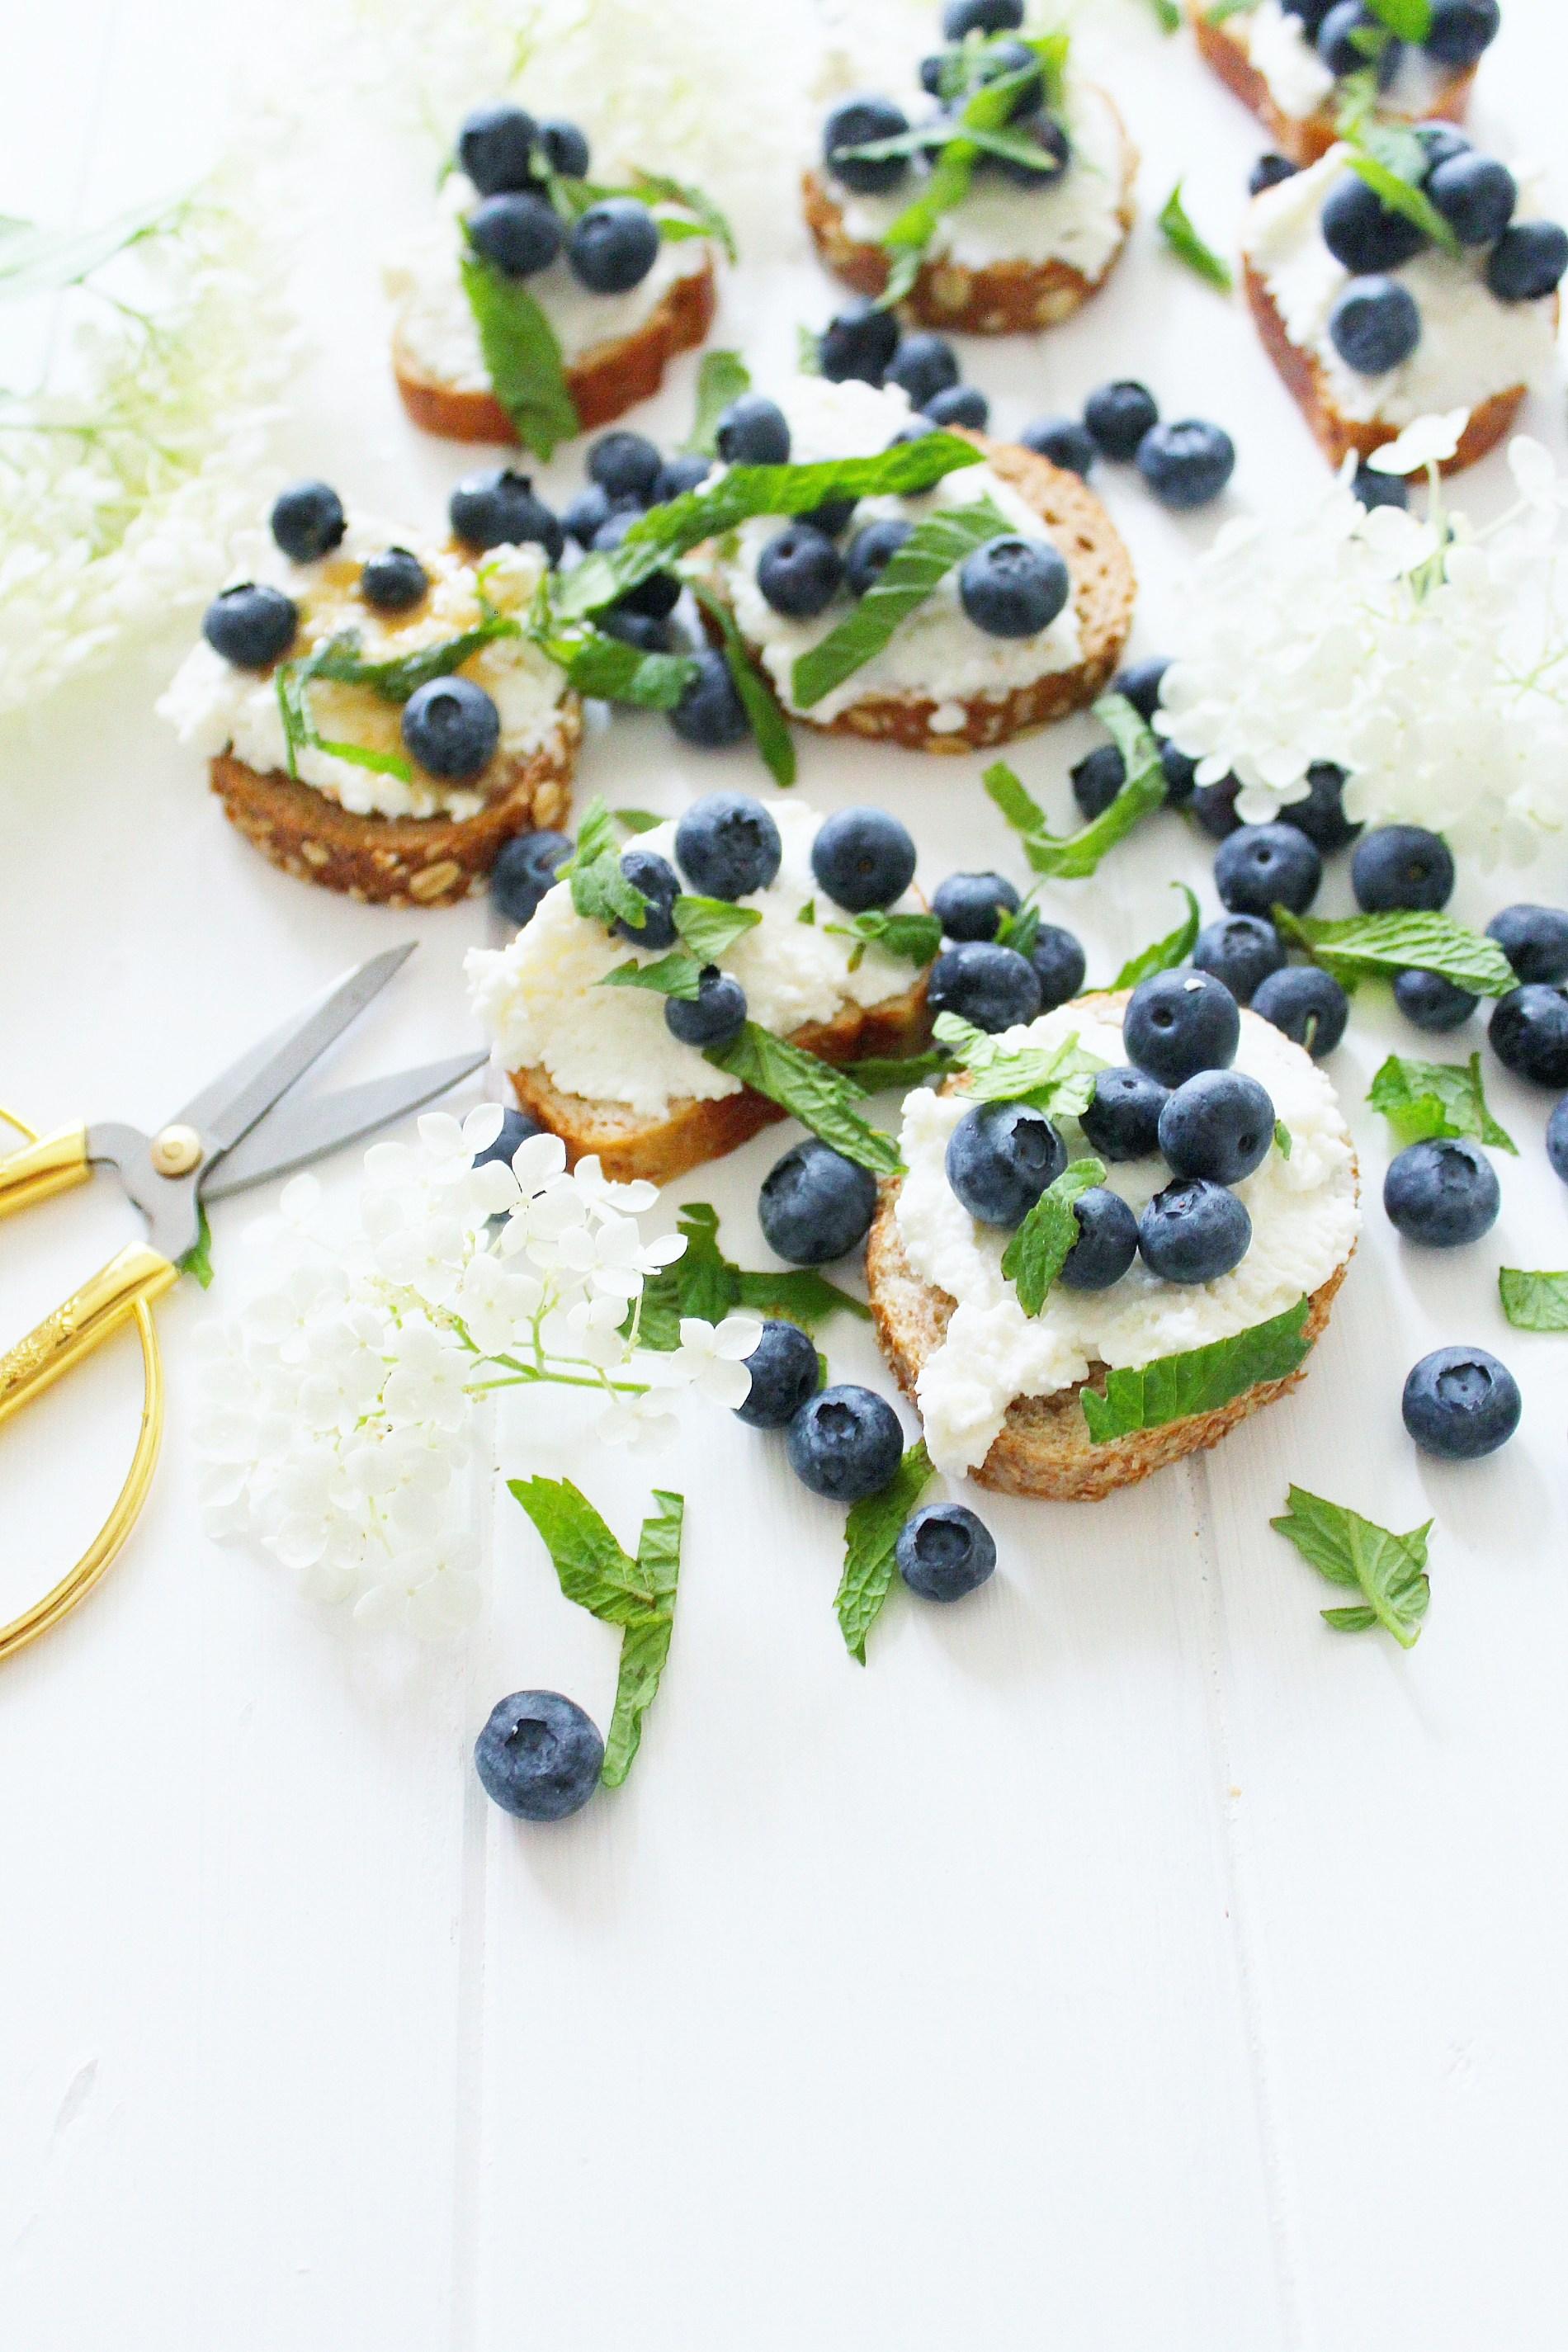 Blueberry Ricotta Crostini with Wildflower Honey